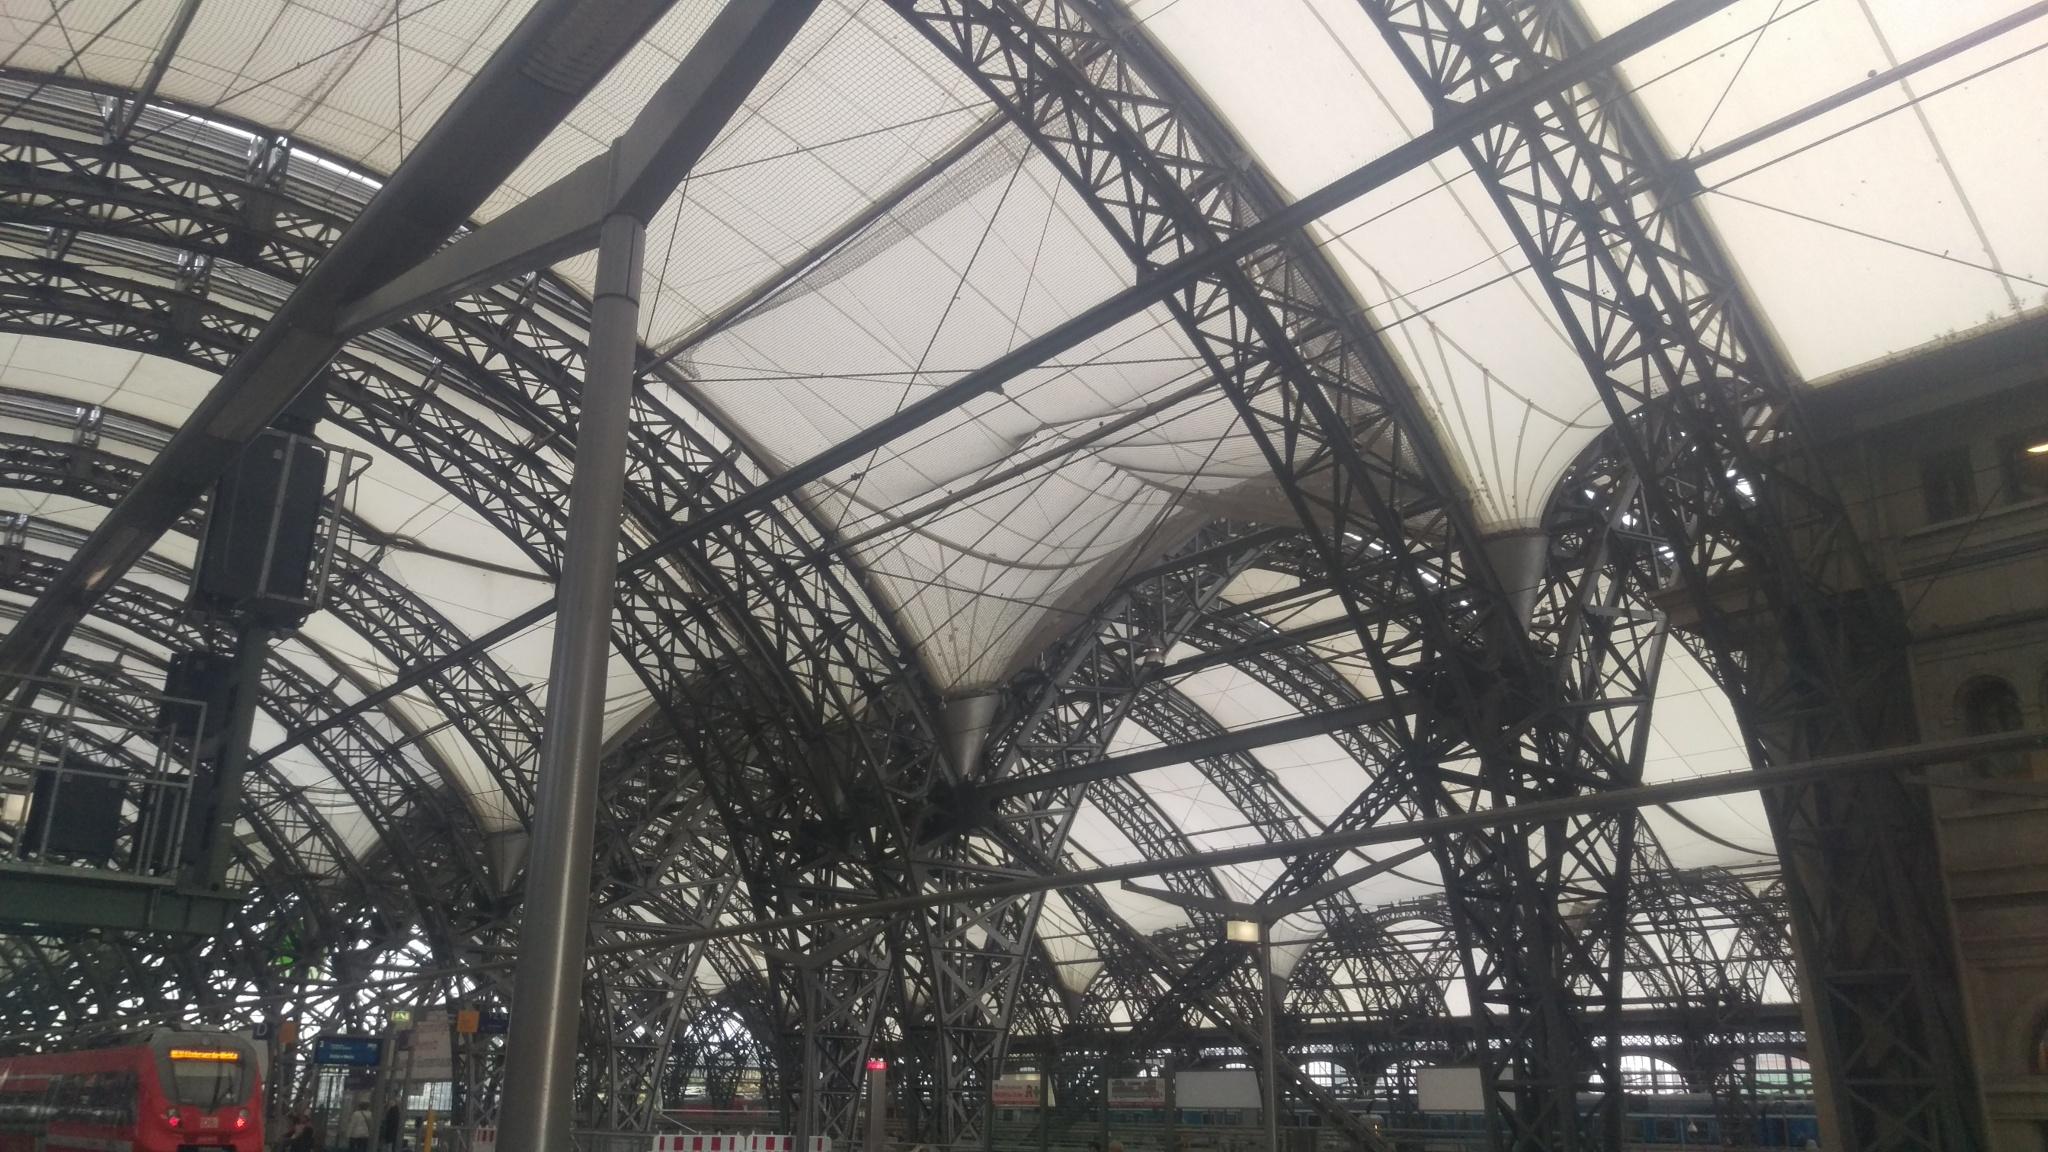 Central Railway Station by iv69spirov